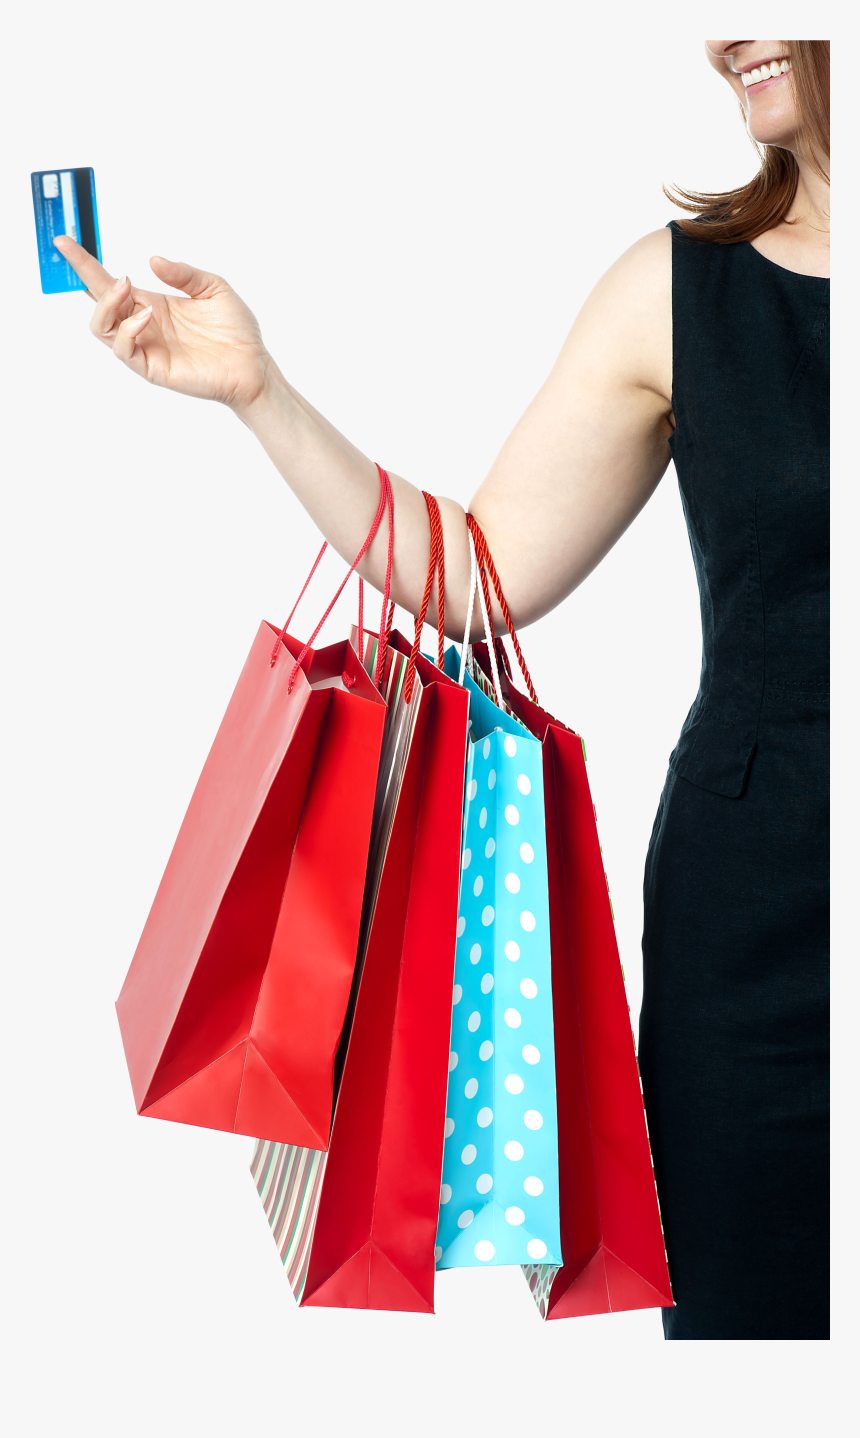 Women Png Image Purepng - Woman Shopping Png, Transparent Png, Free Download